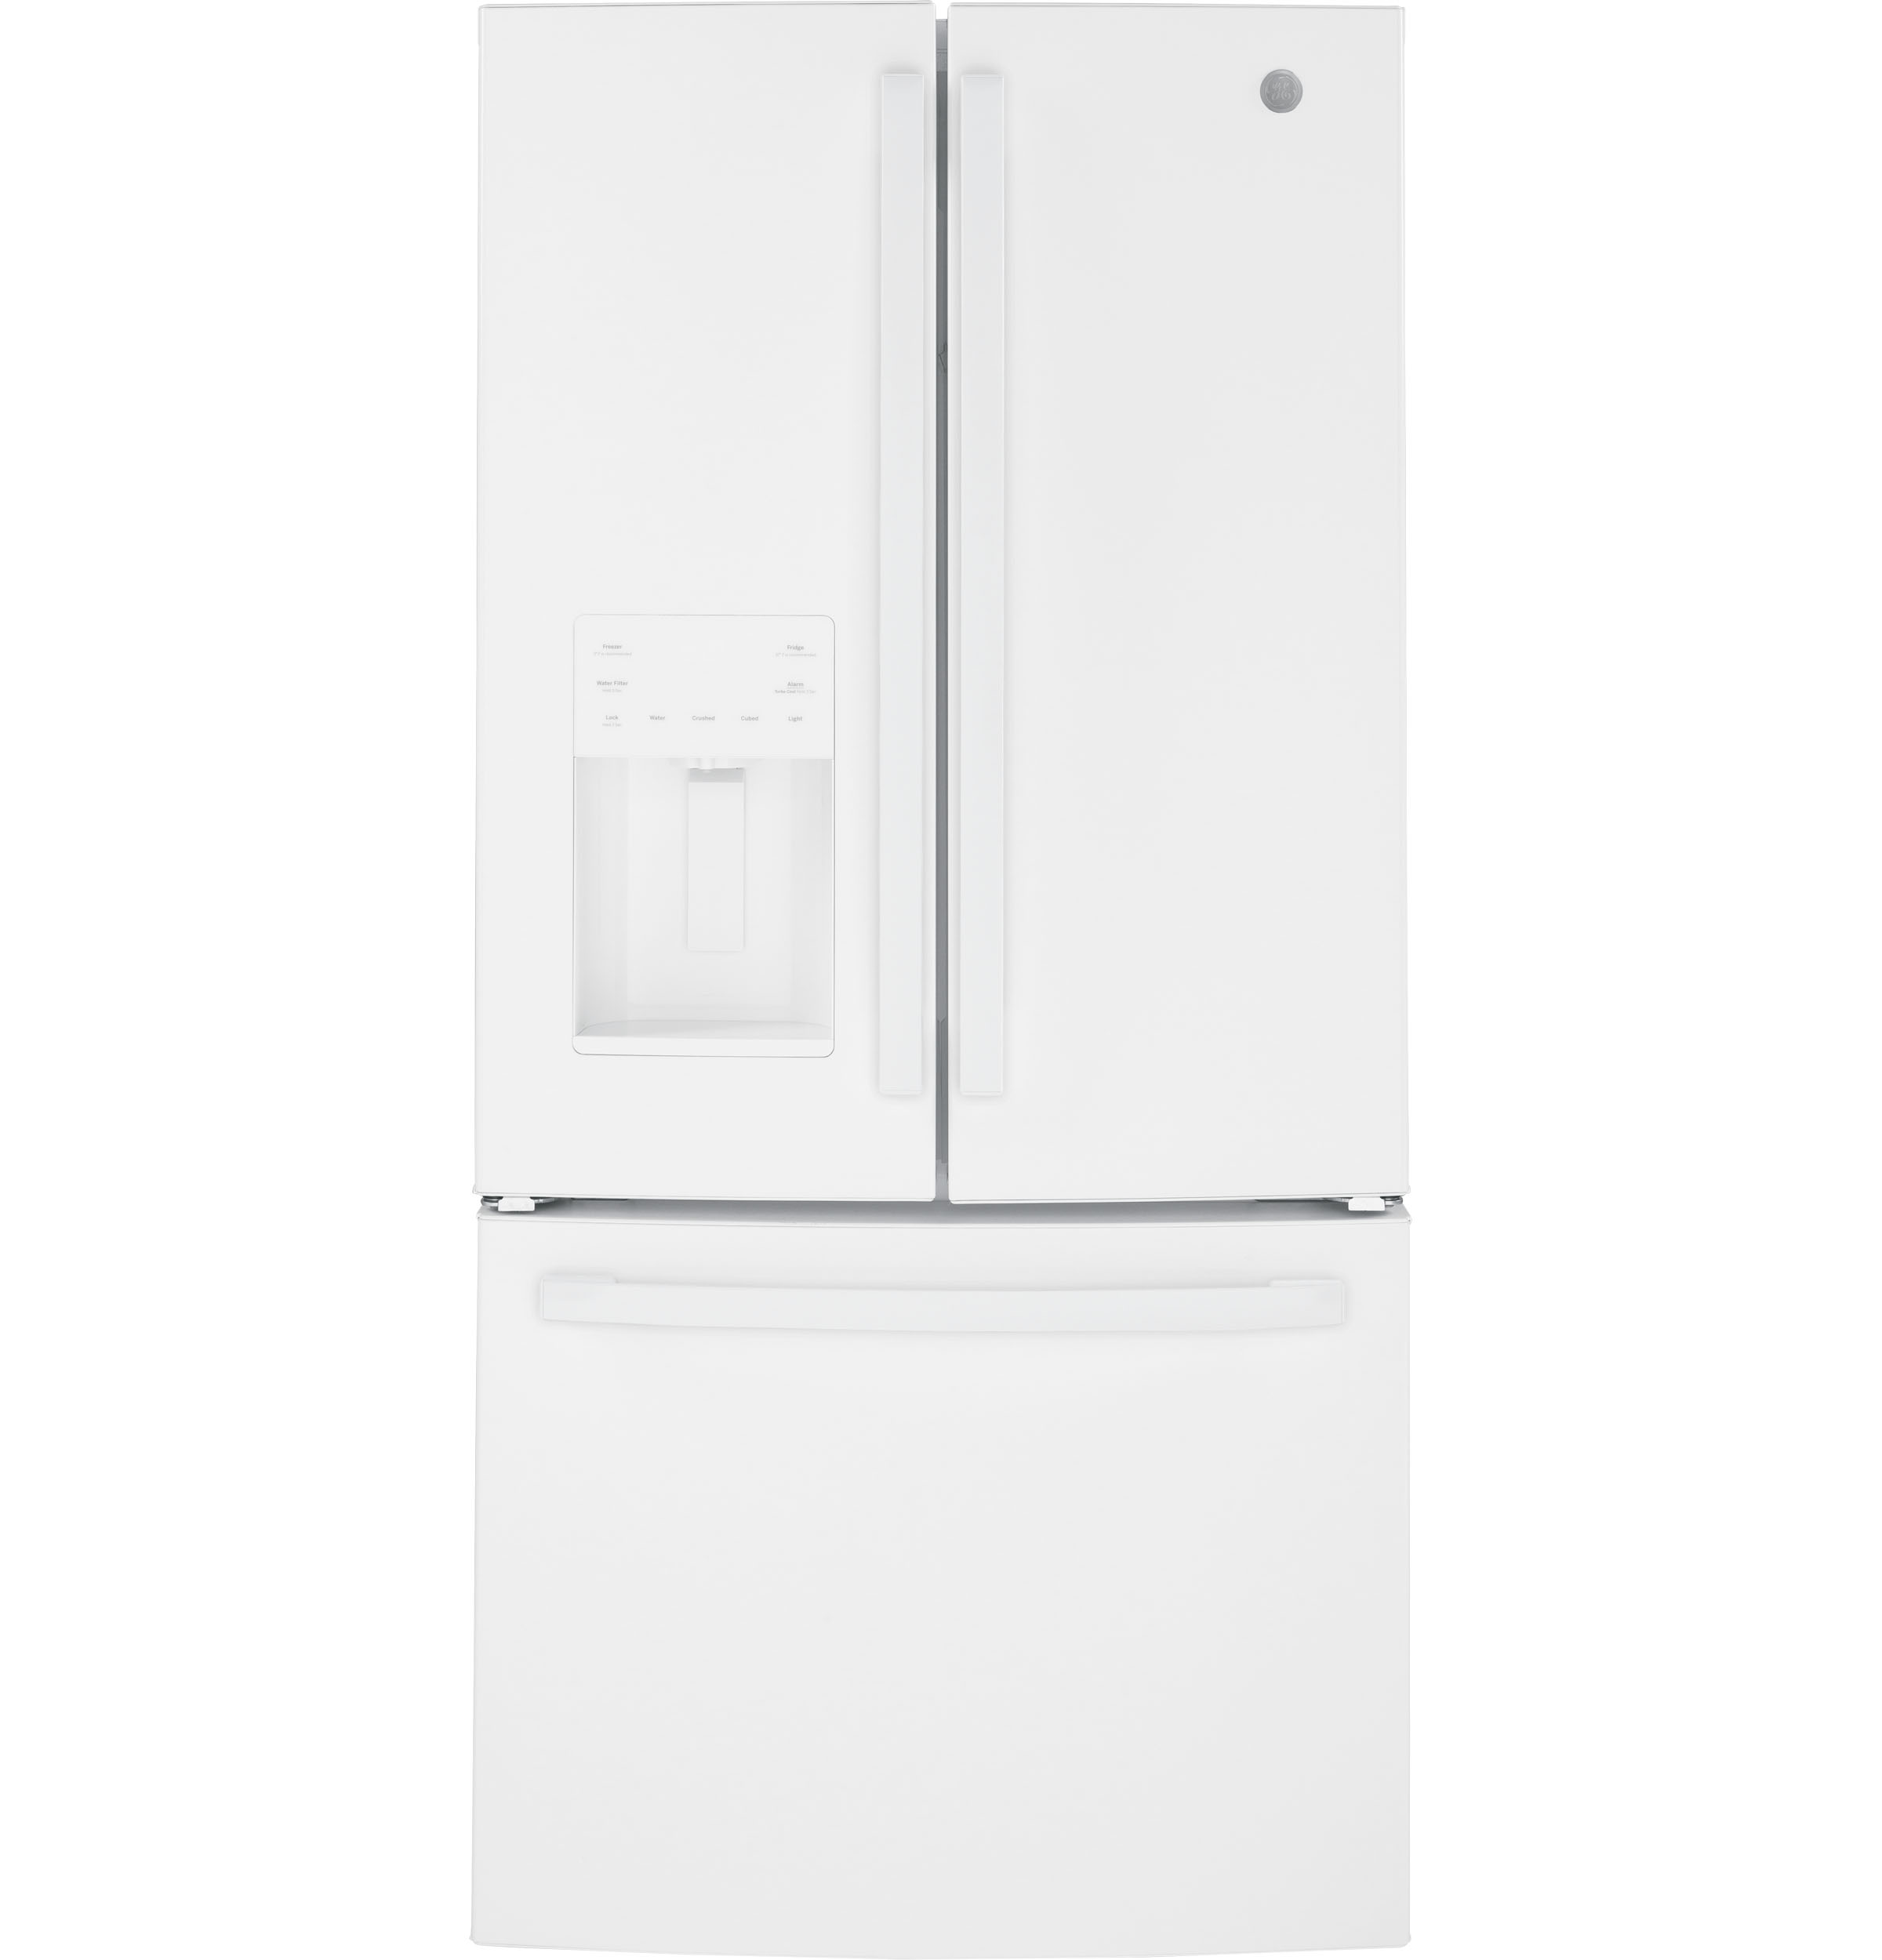 GE GE® ENERGY STAR® 23.6 Cu. Ft. French-Door Refrigerator